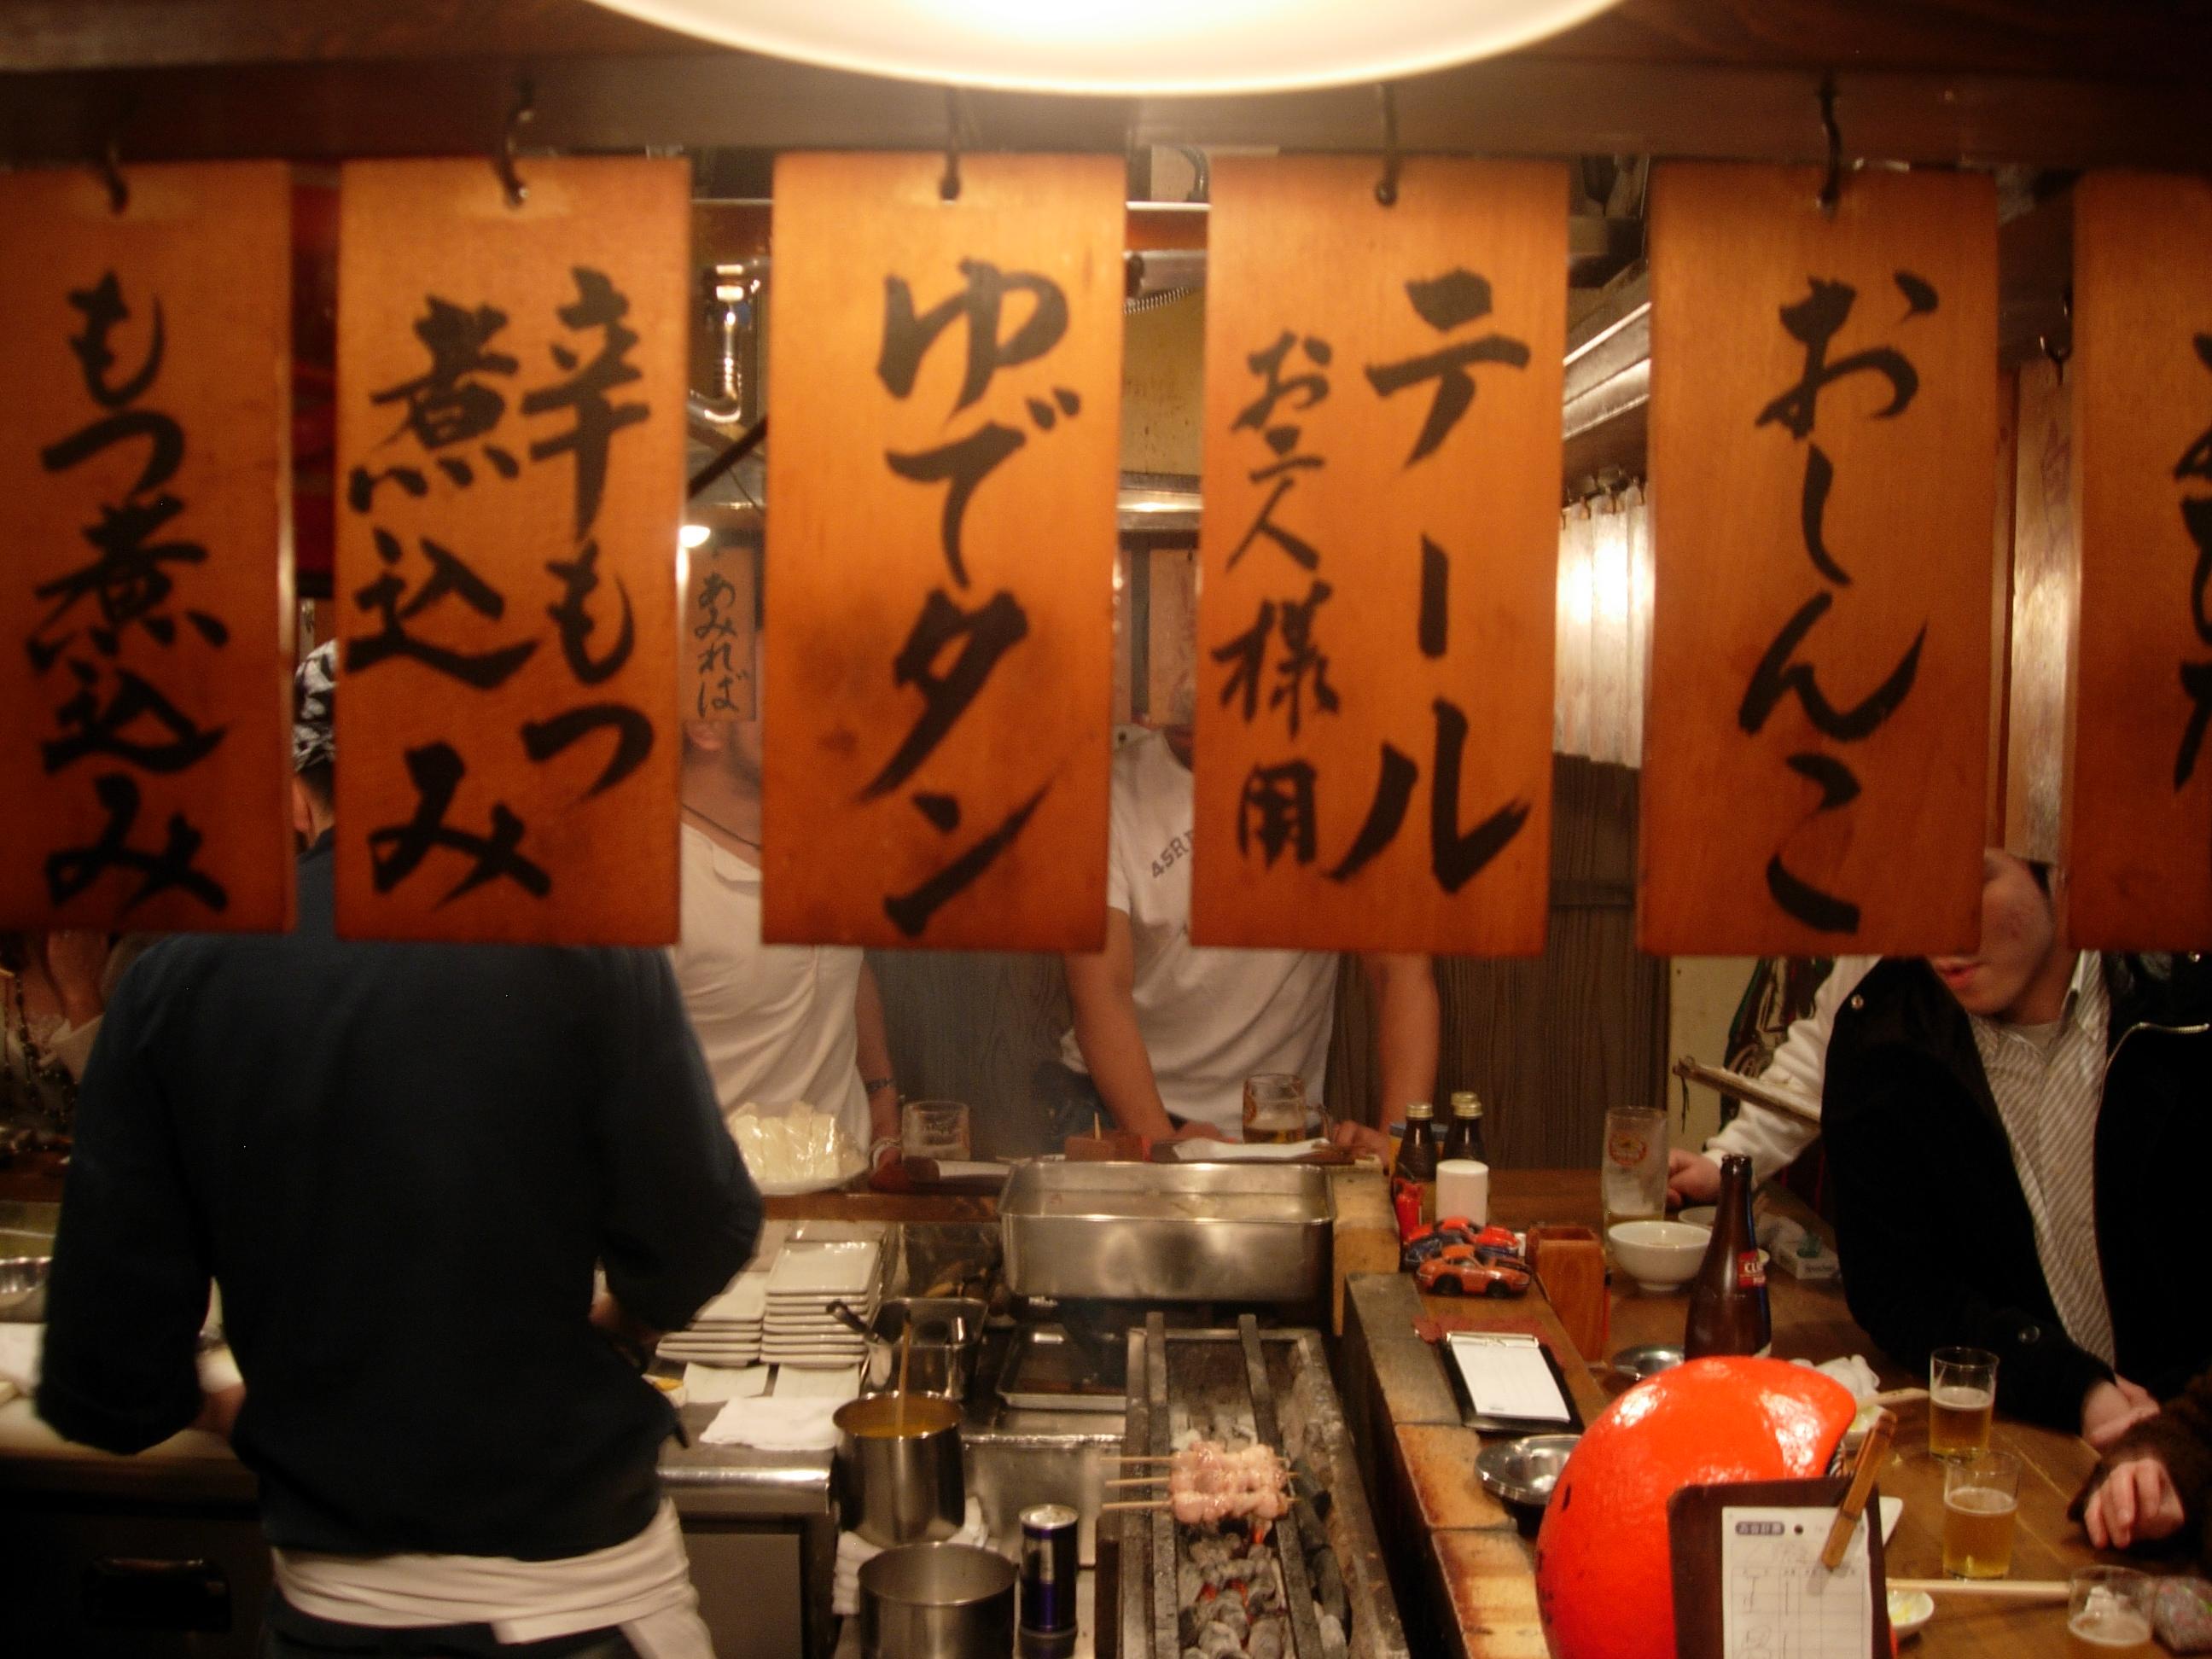 The grill at Saiseisakaba